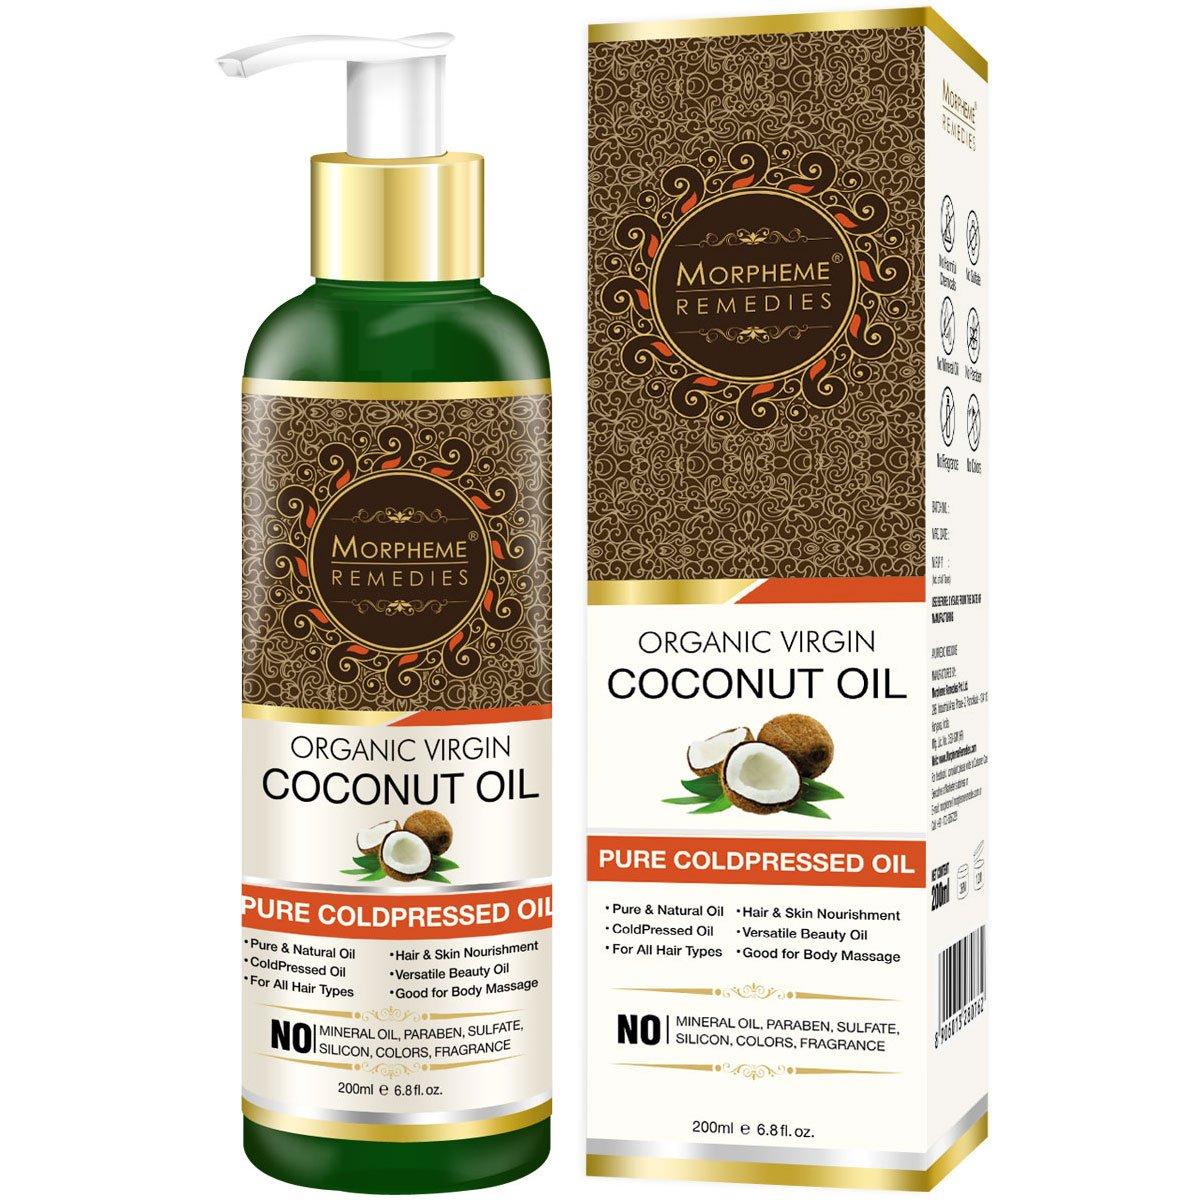 Morpheme Remedies Cold Pressed Organic Virgin Coconut Oil, 200ml product image